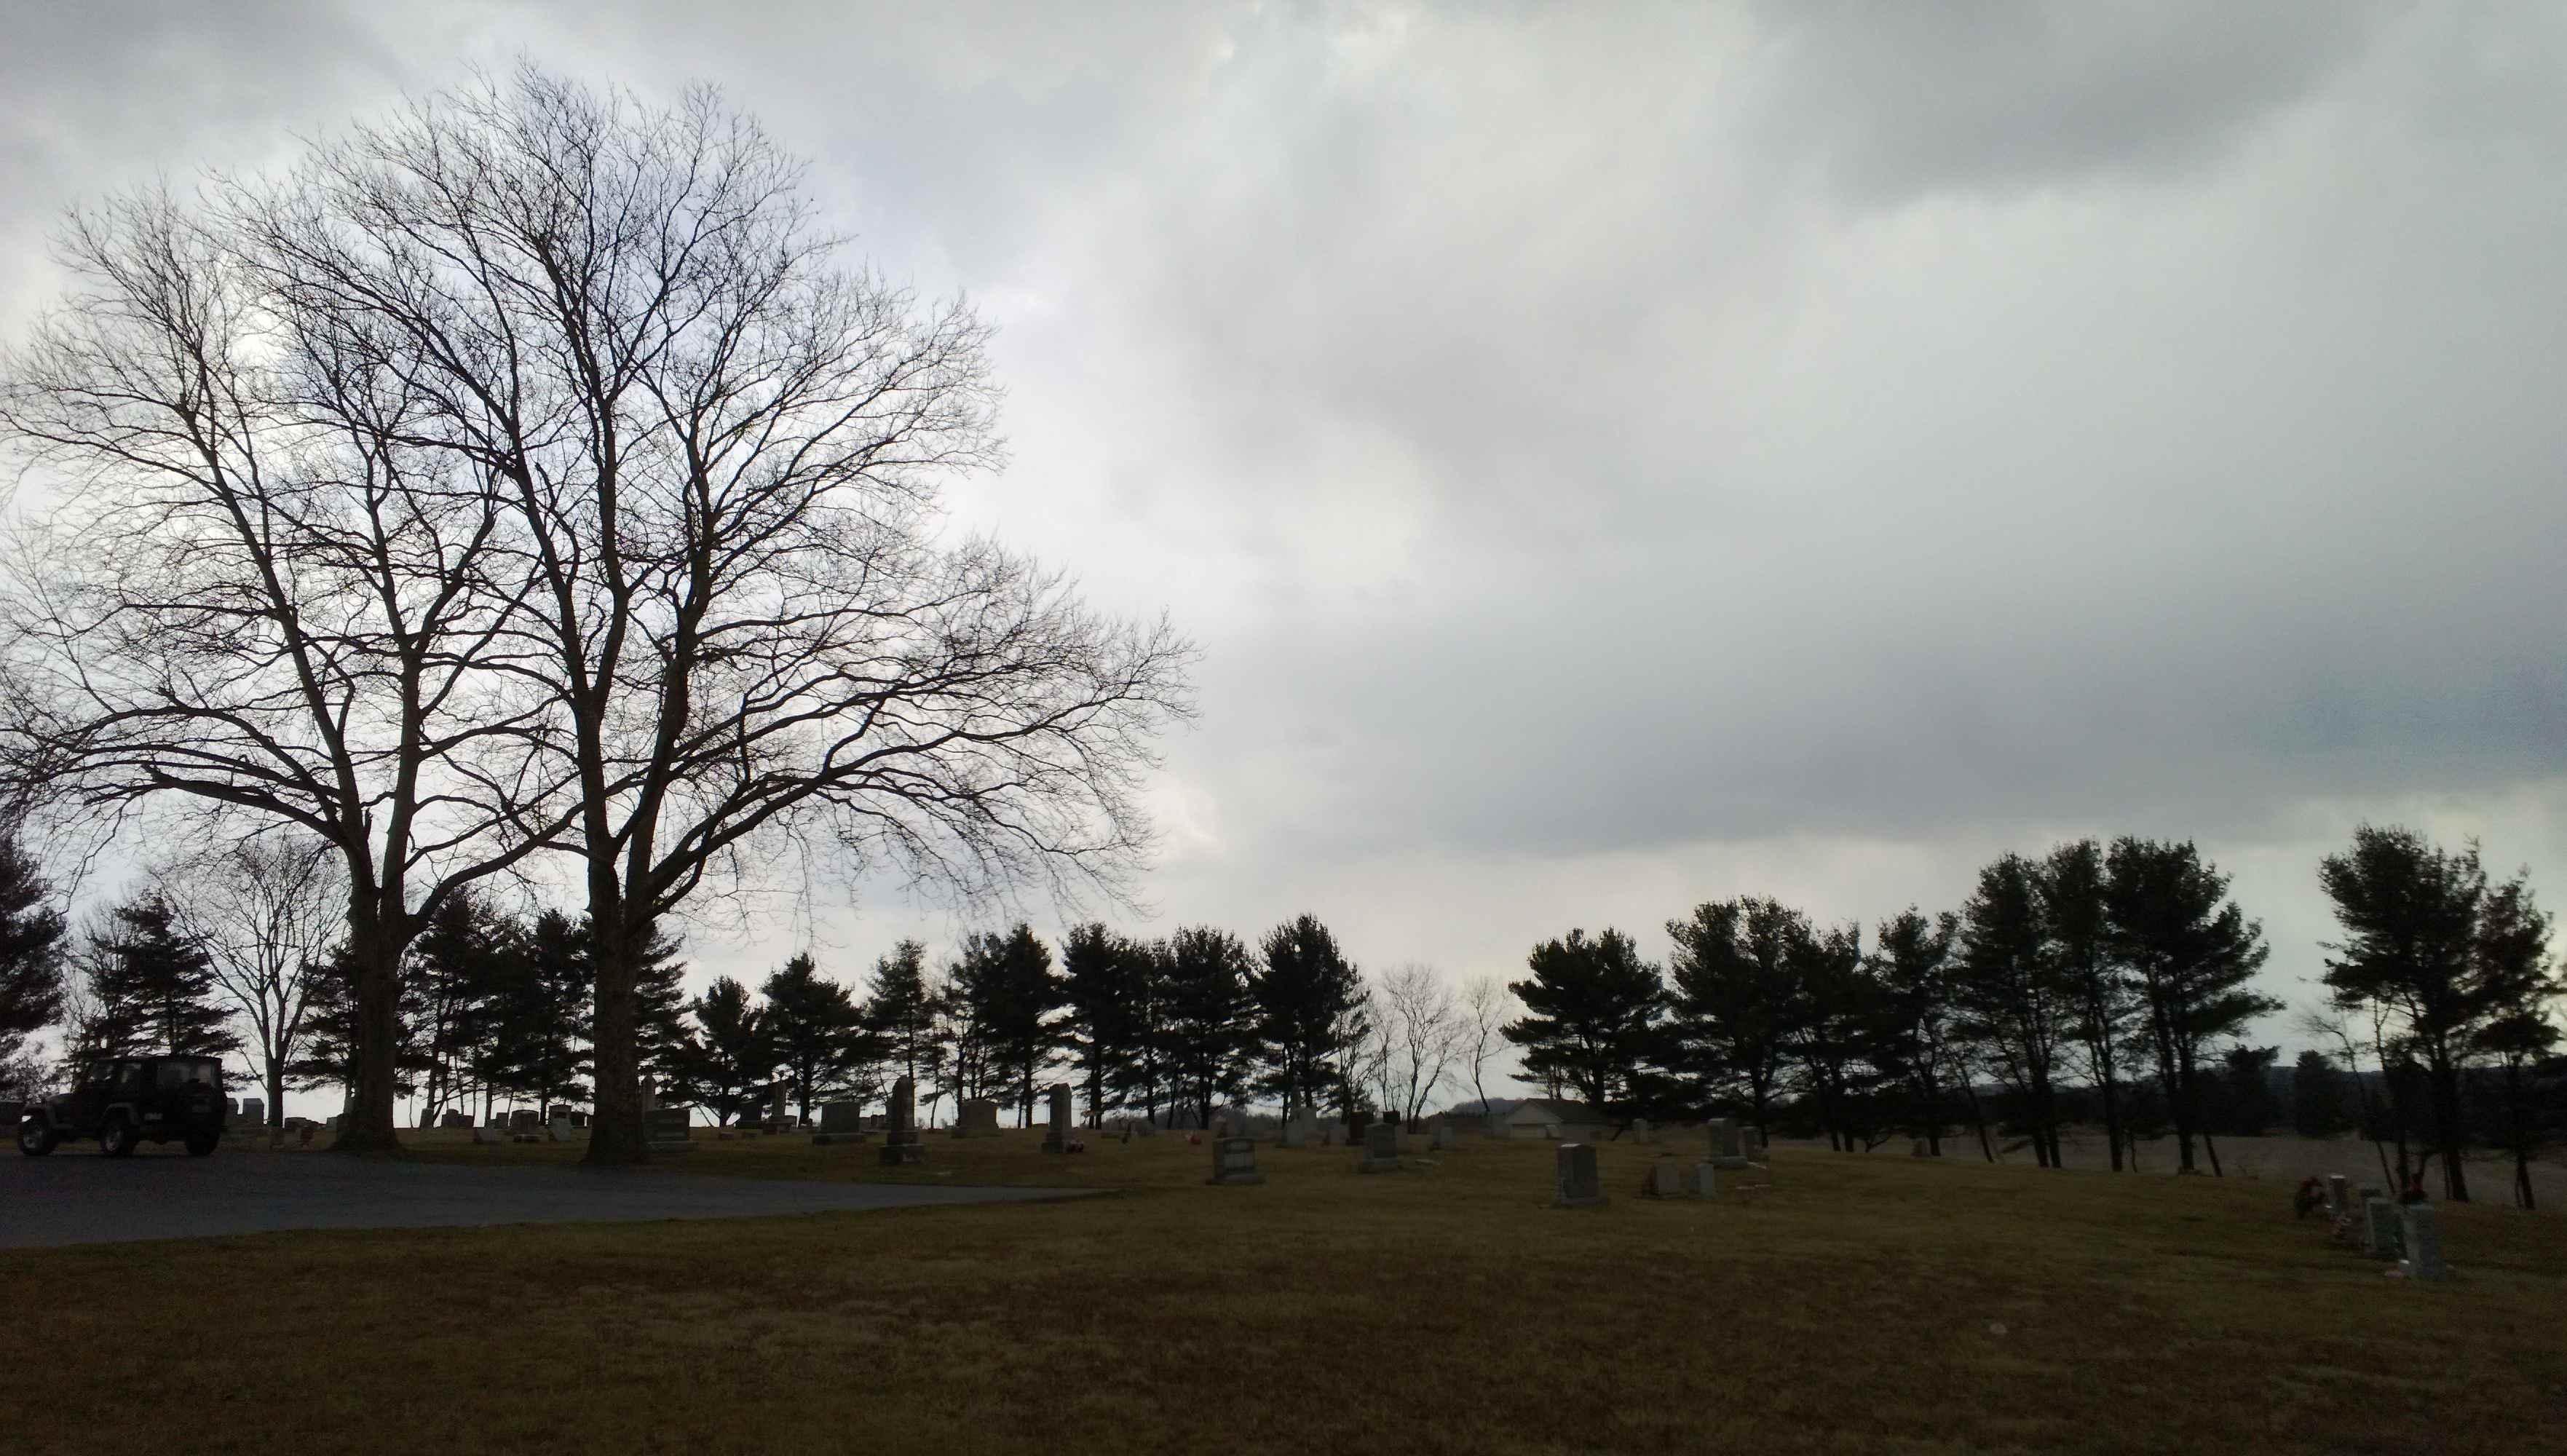 Broadview Cemetery